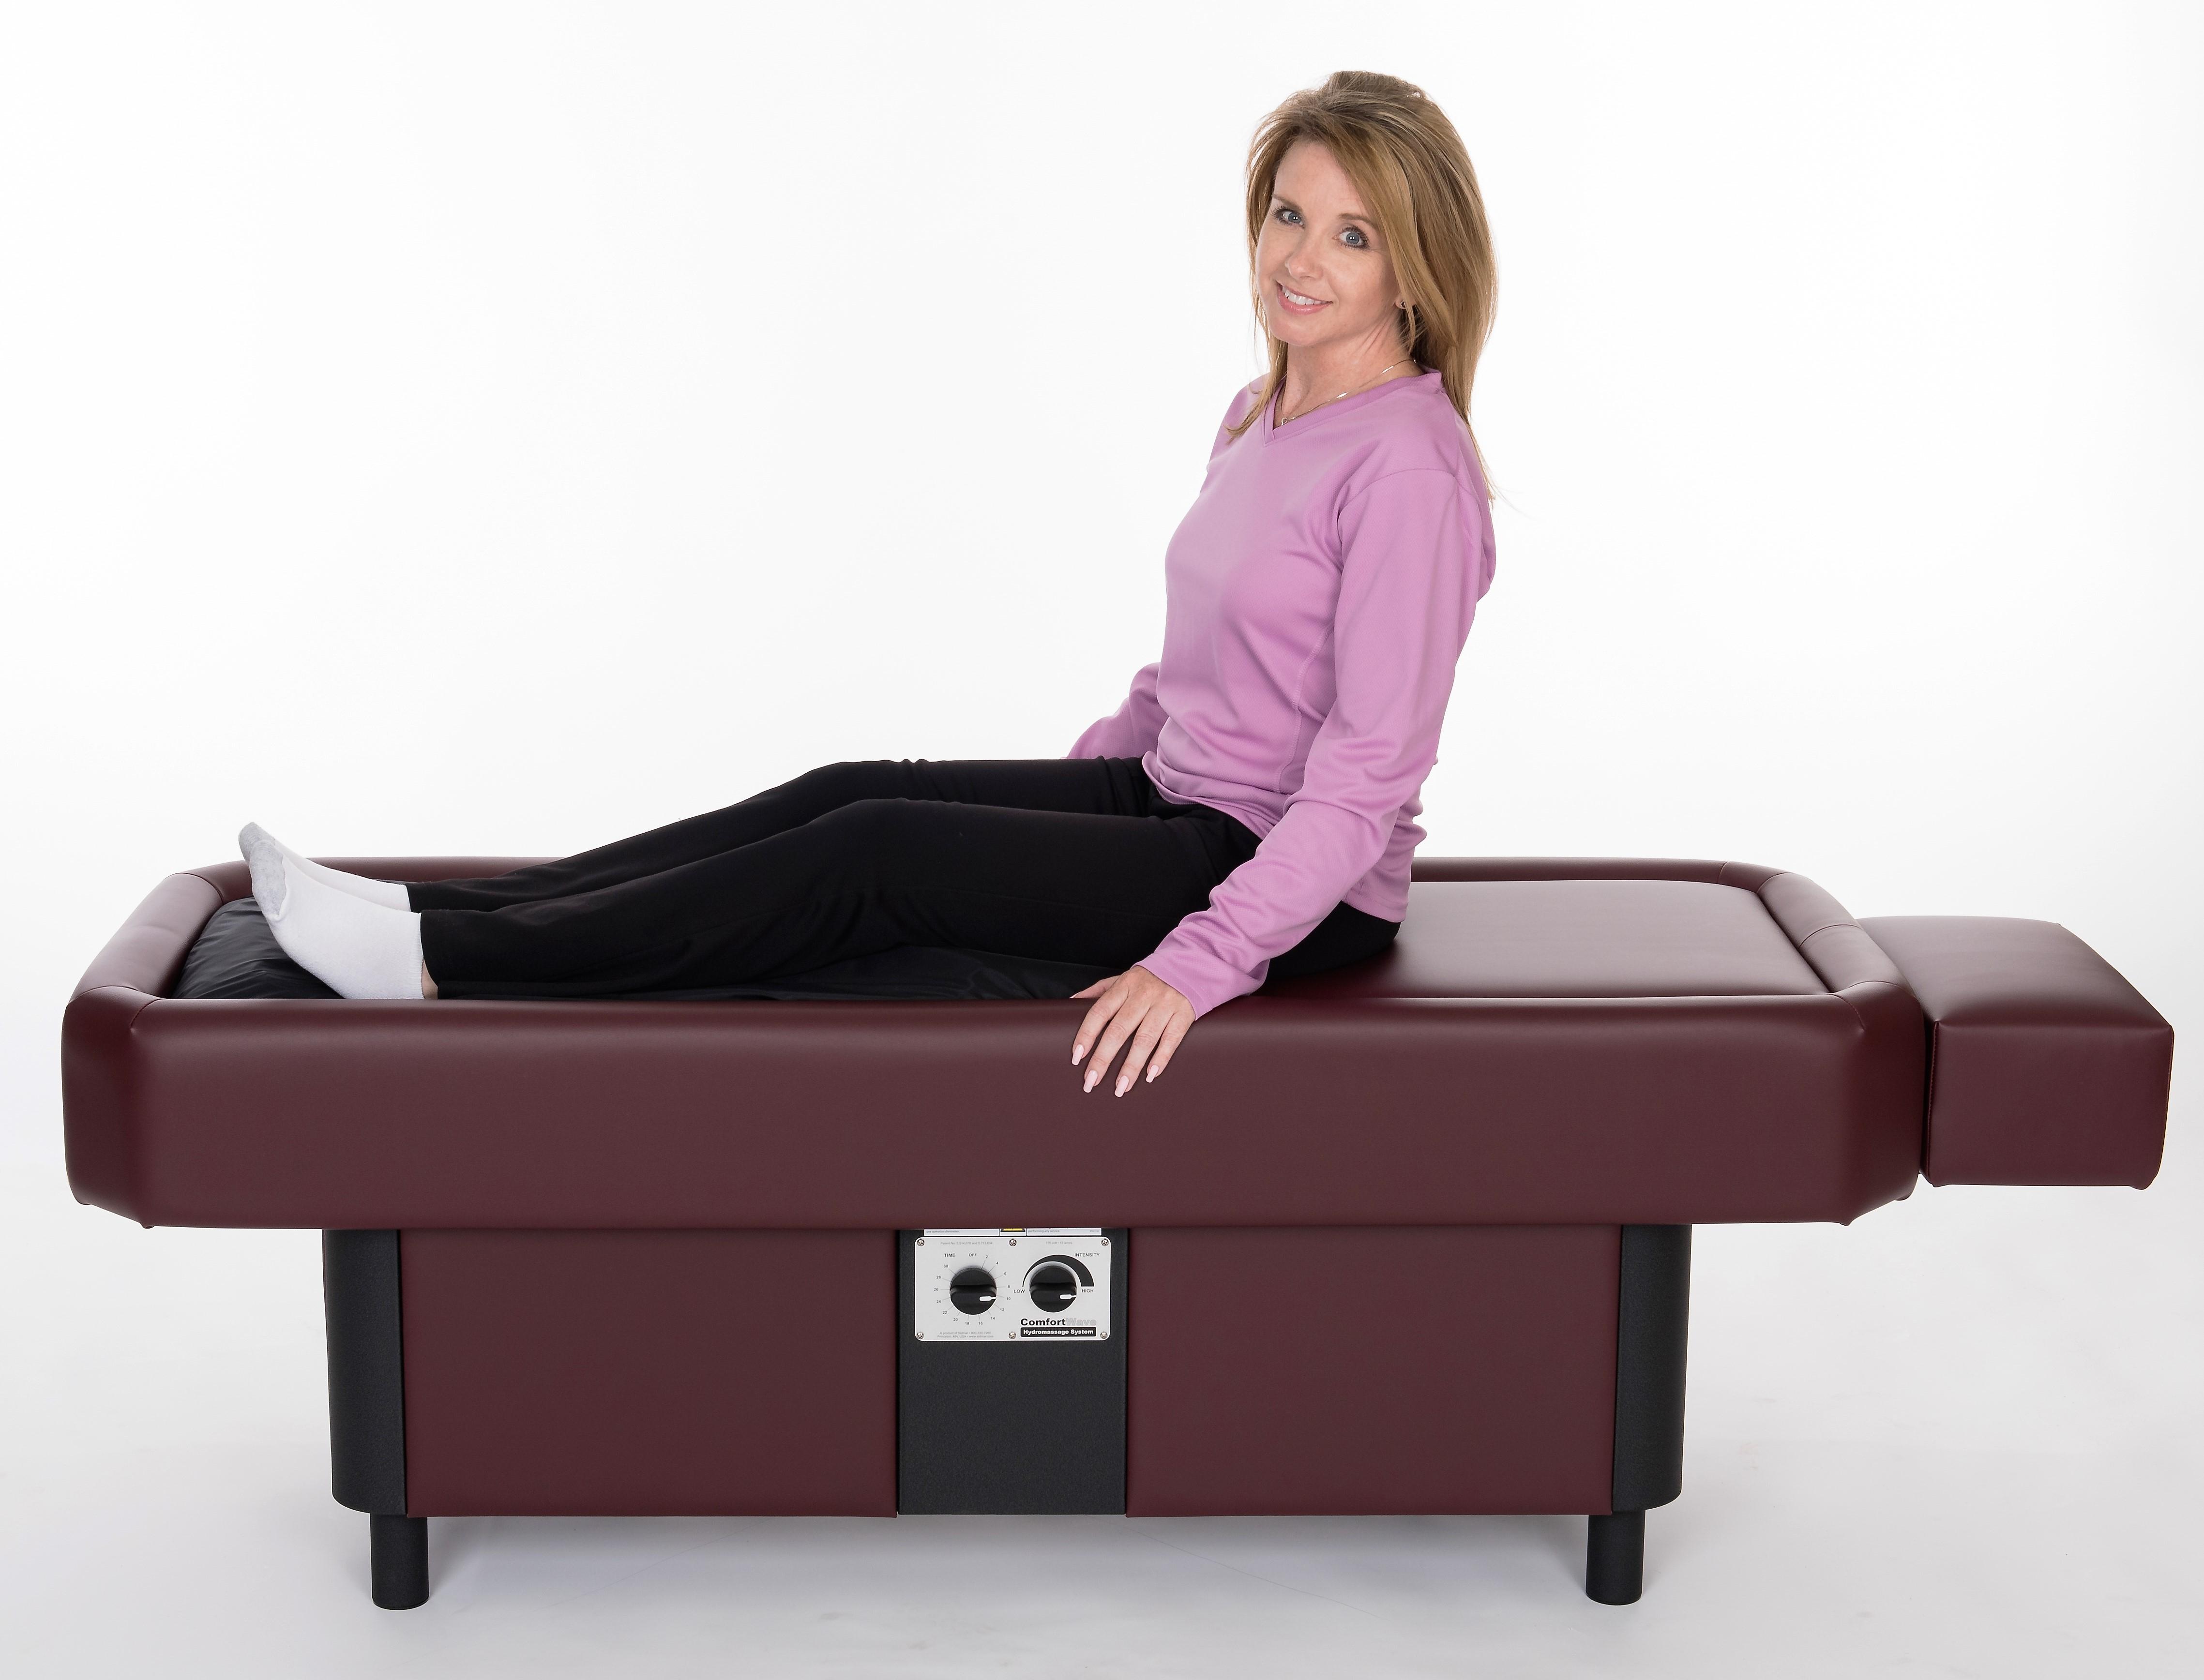 lady getting legs massaged on hydromassage table